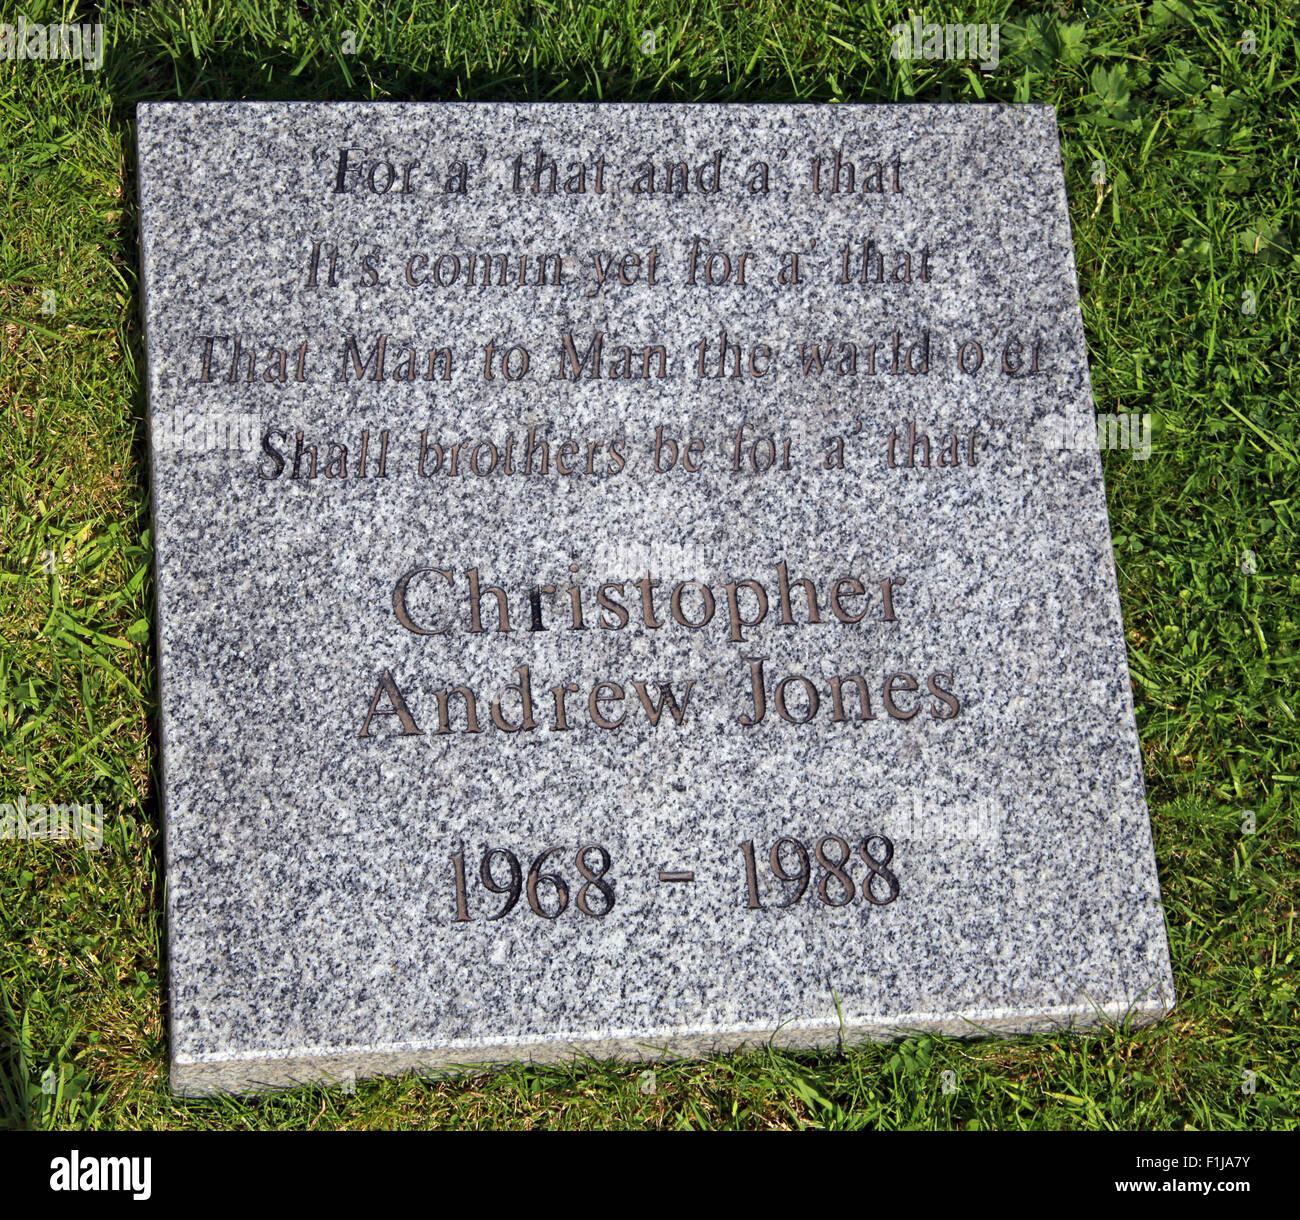 Lockerbie PanAm103 In Rememberance Memorial Christopher Andrew Jones, Scotland - Stock Image